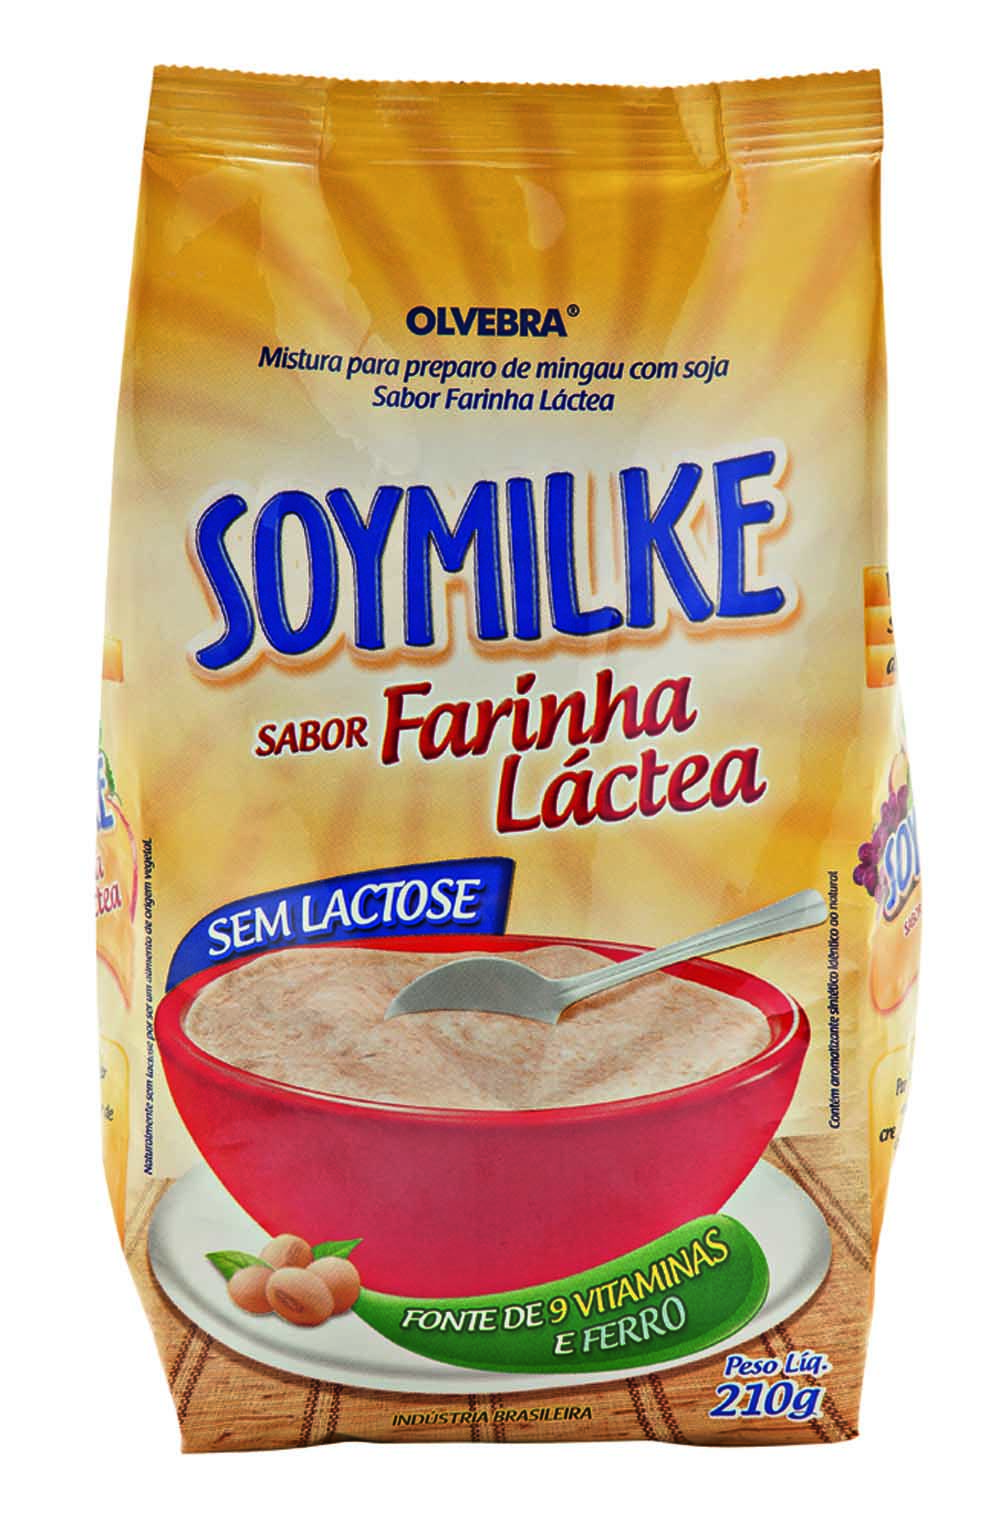 Soymilke Farinha Lactea Sachê 210g